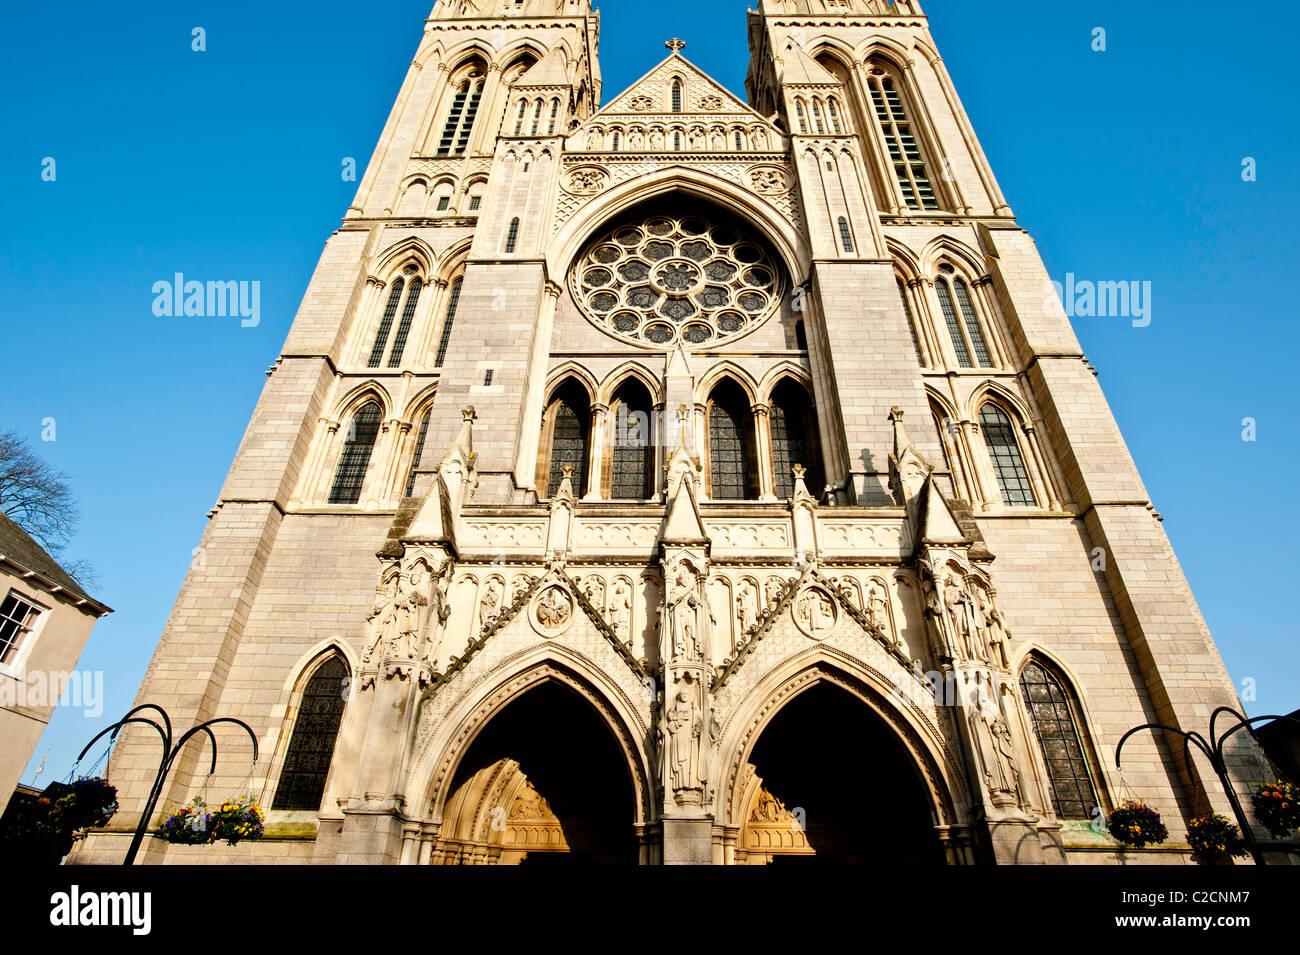 Cathedral, Truro, Cornwall, United Kingdom - Stock Image